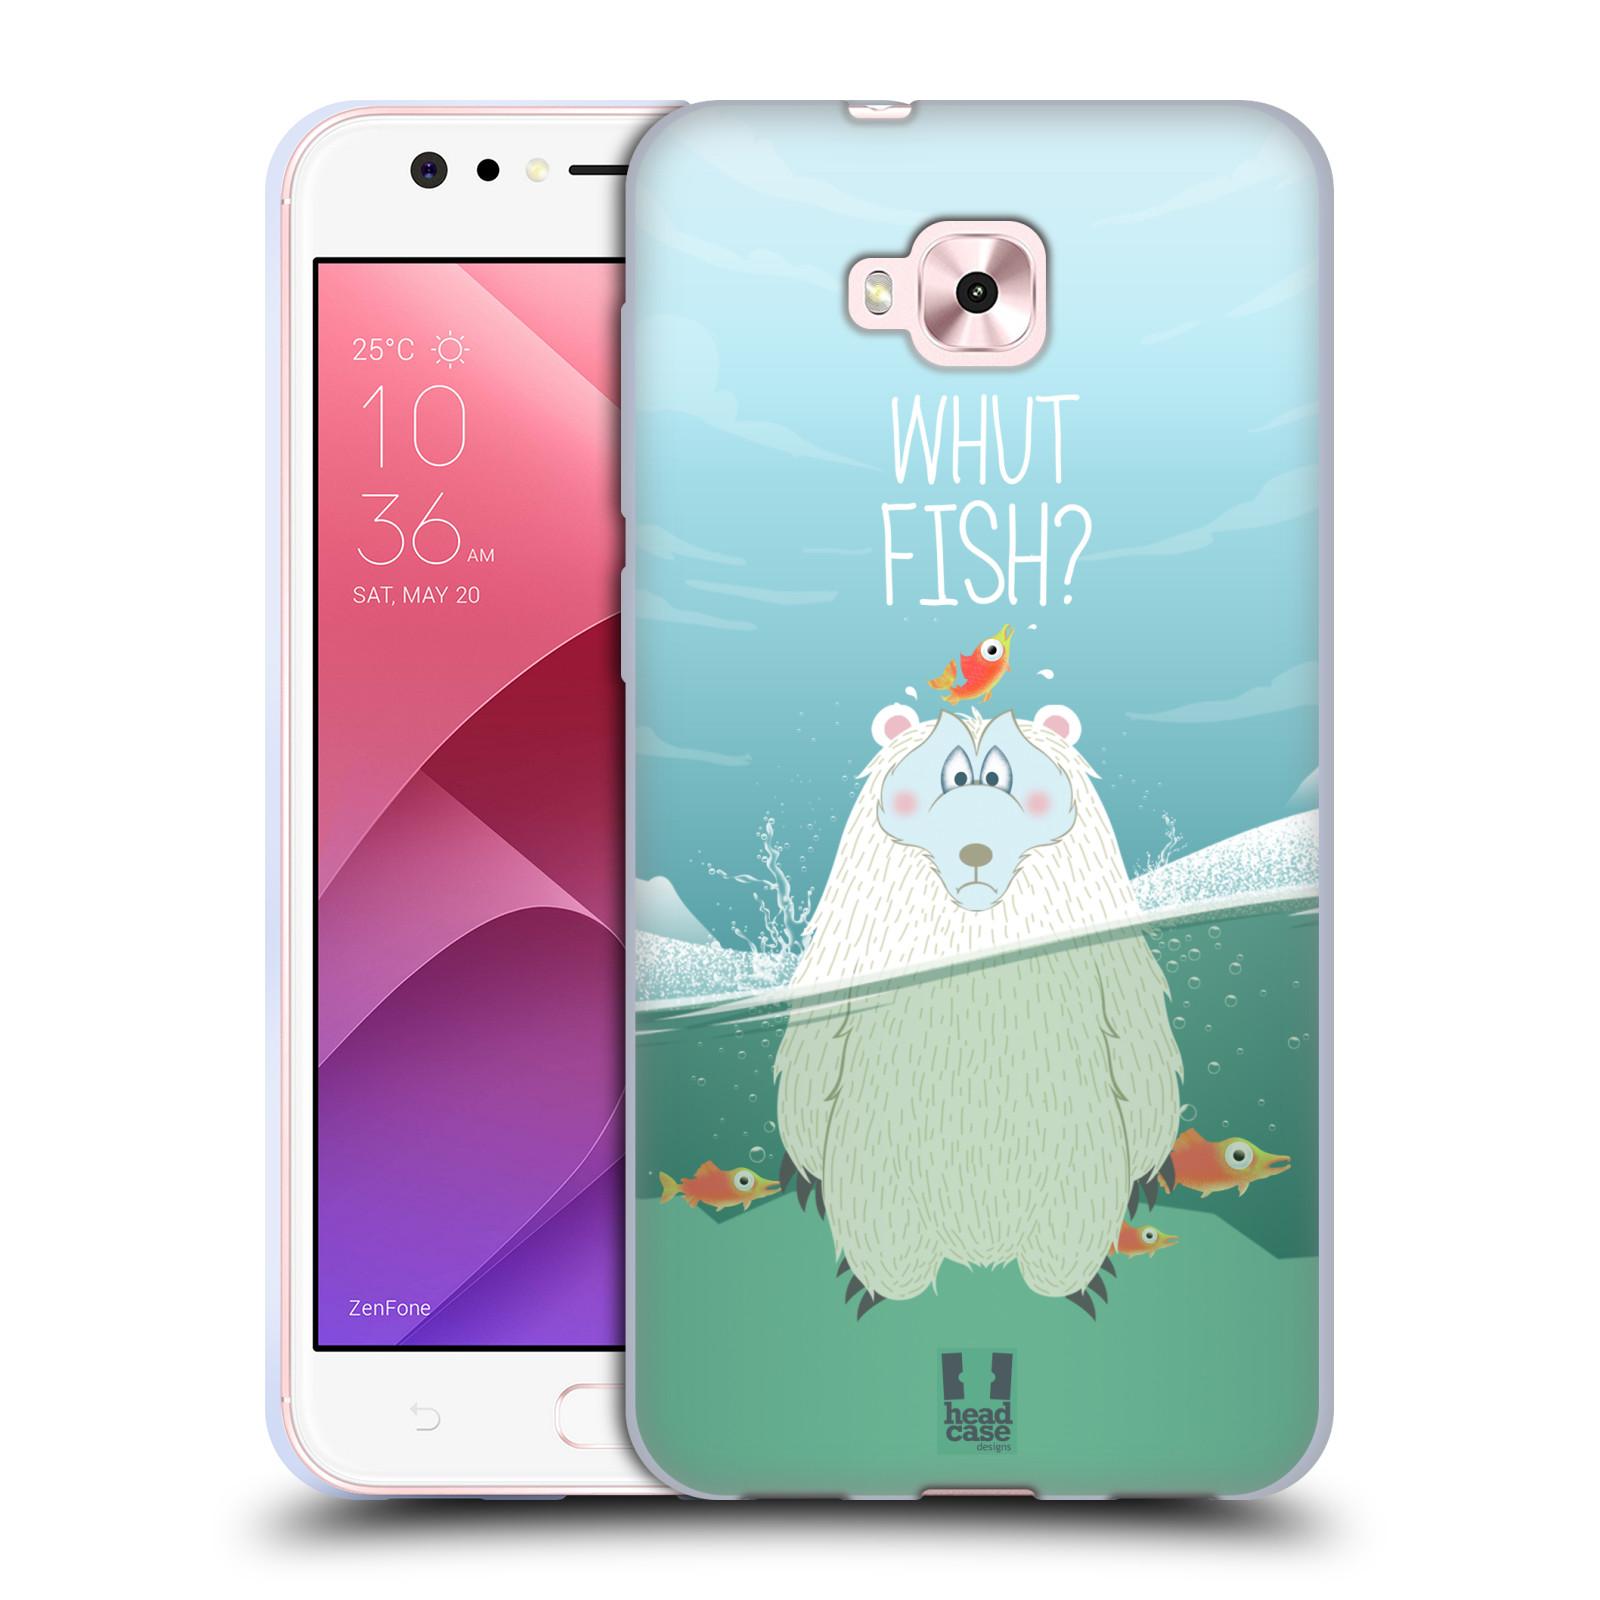 Silikonové pouzdro na mobil Asus Zenfone 4 Selfie ZD553KL - Head Case - Medvěd Whut Fish?